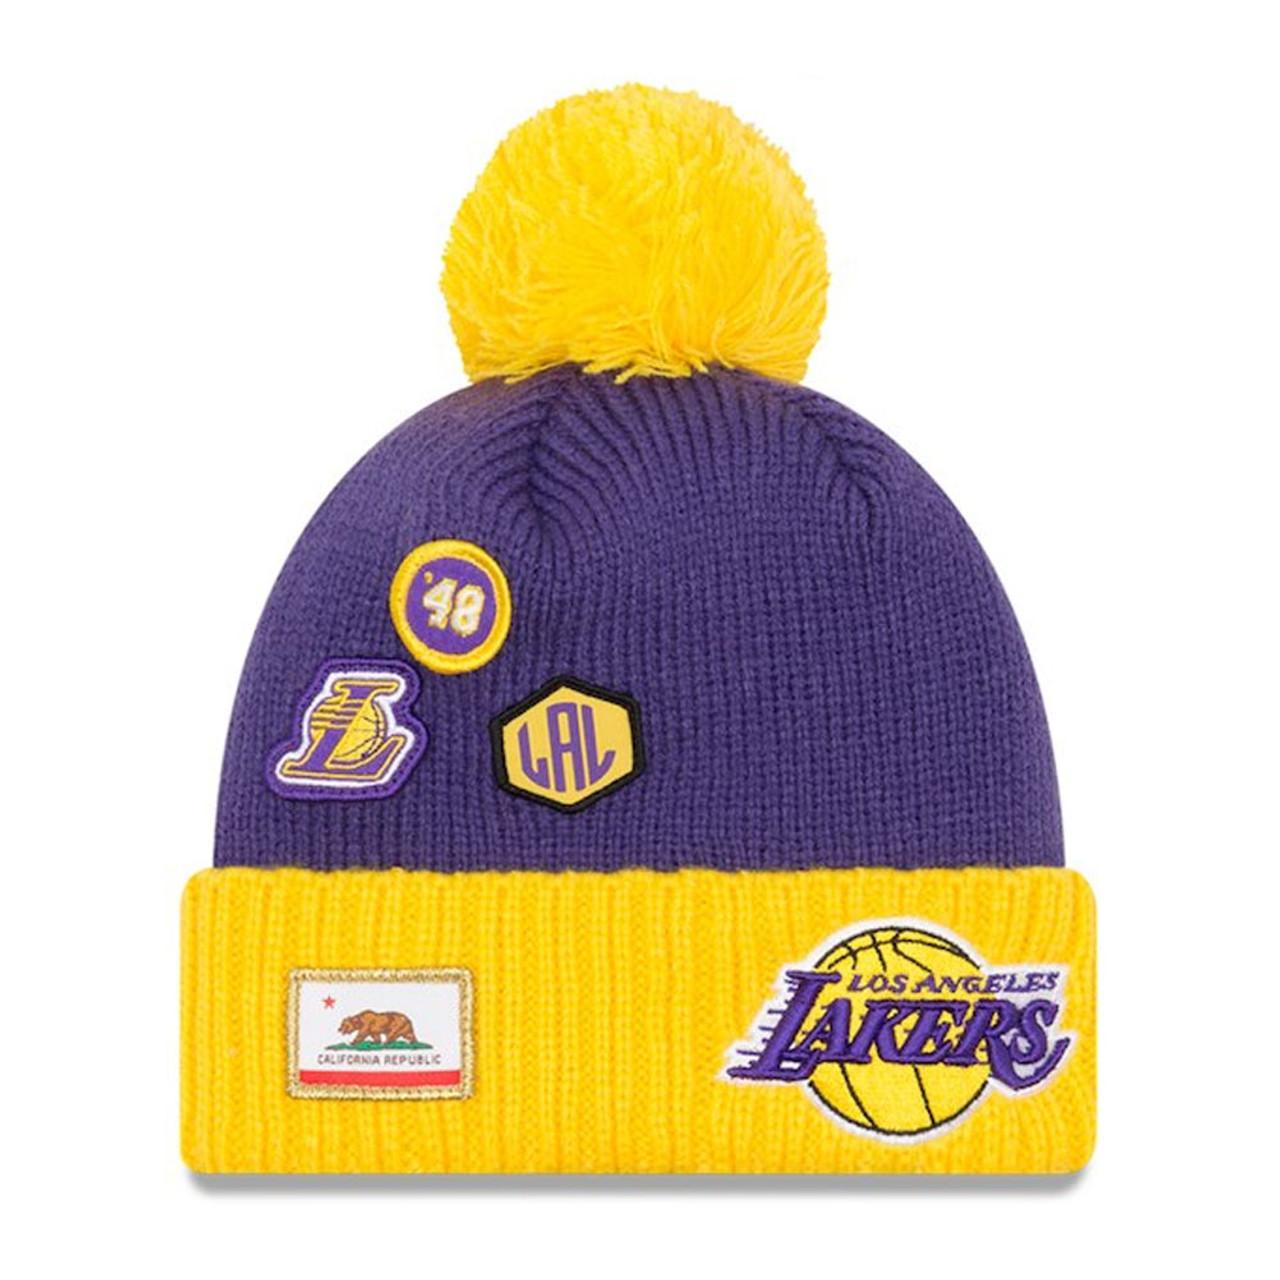 NEW ERA los angeles lakers NBA basketball team draft cuffed knit hat ... c49588384